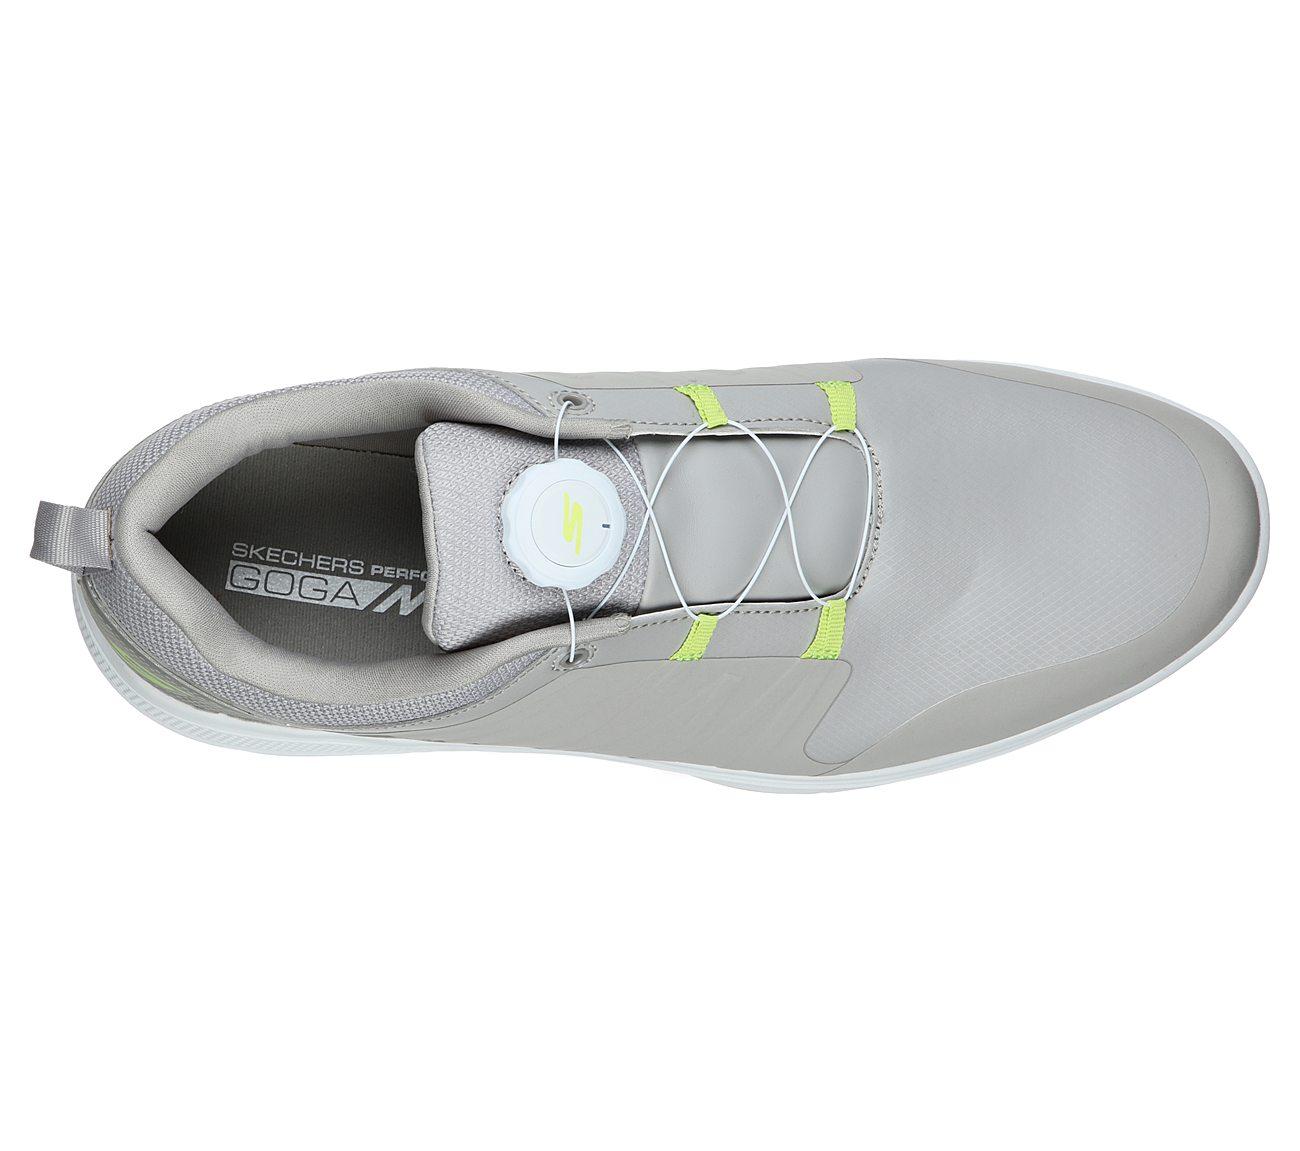 Skechers Men's Go Gole Torque Twist Grey/Lime Golf Shoe